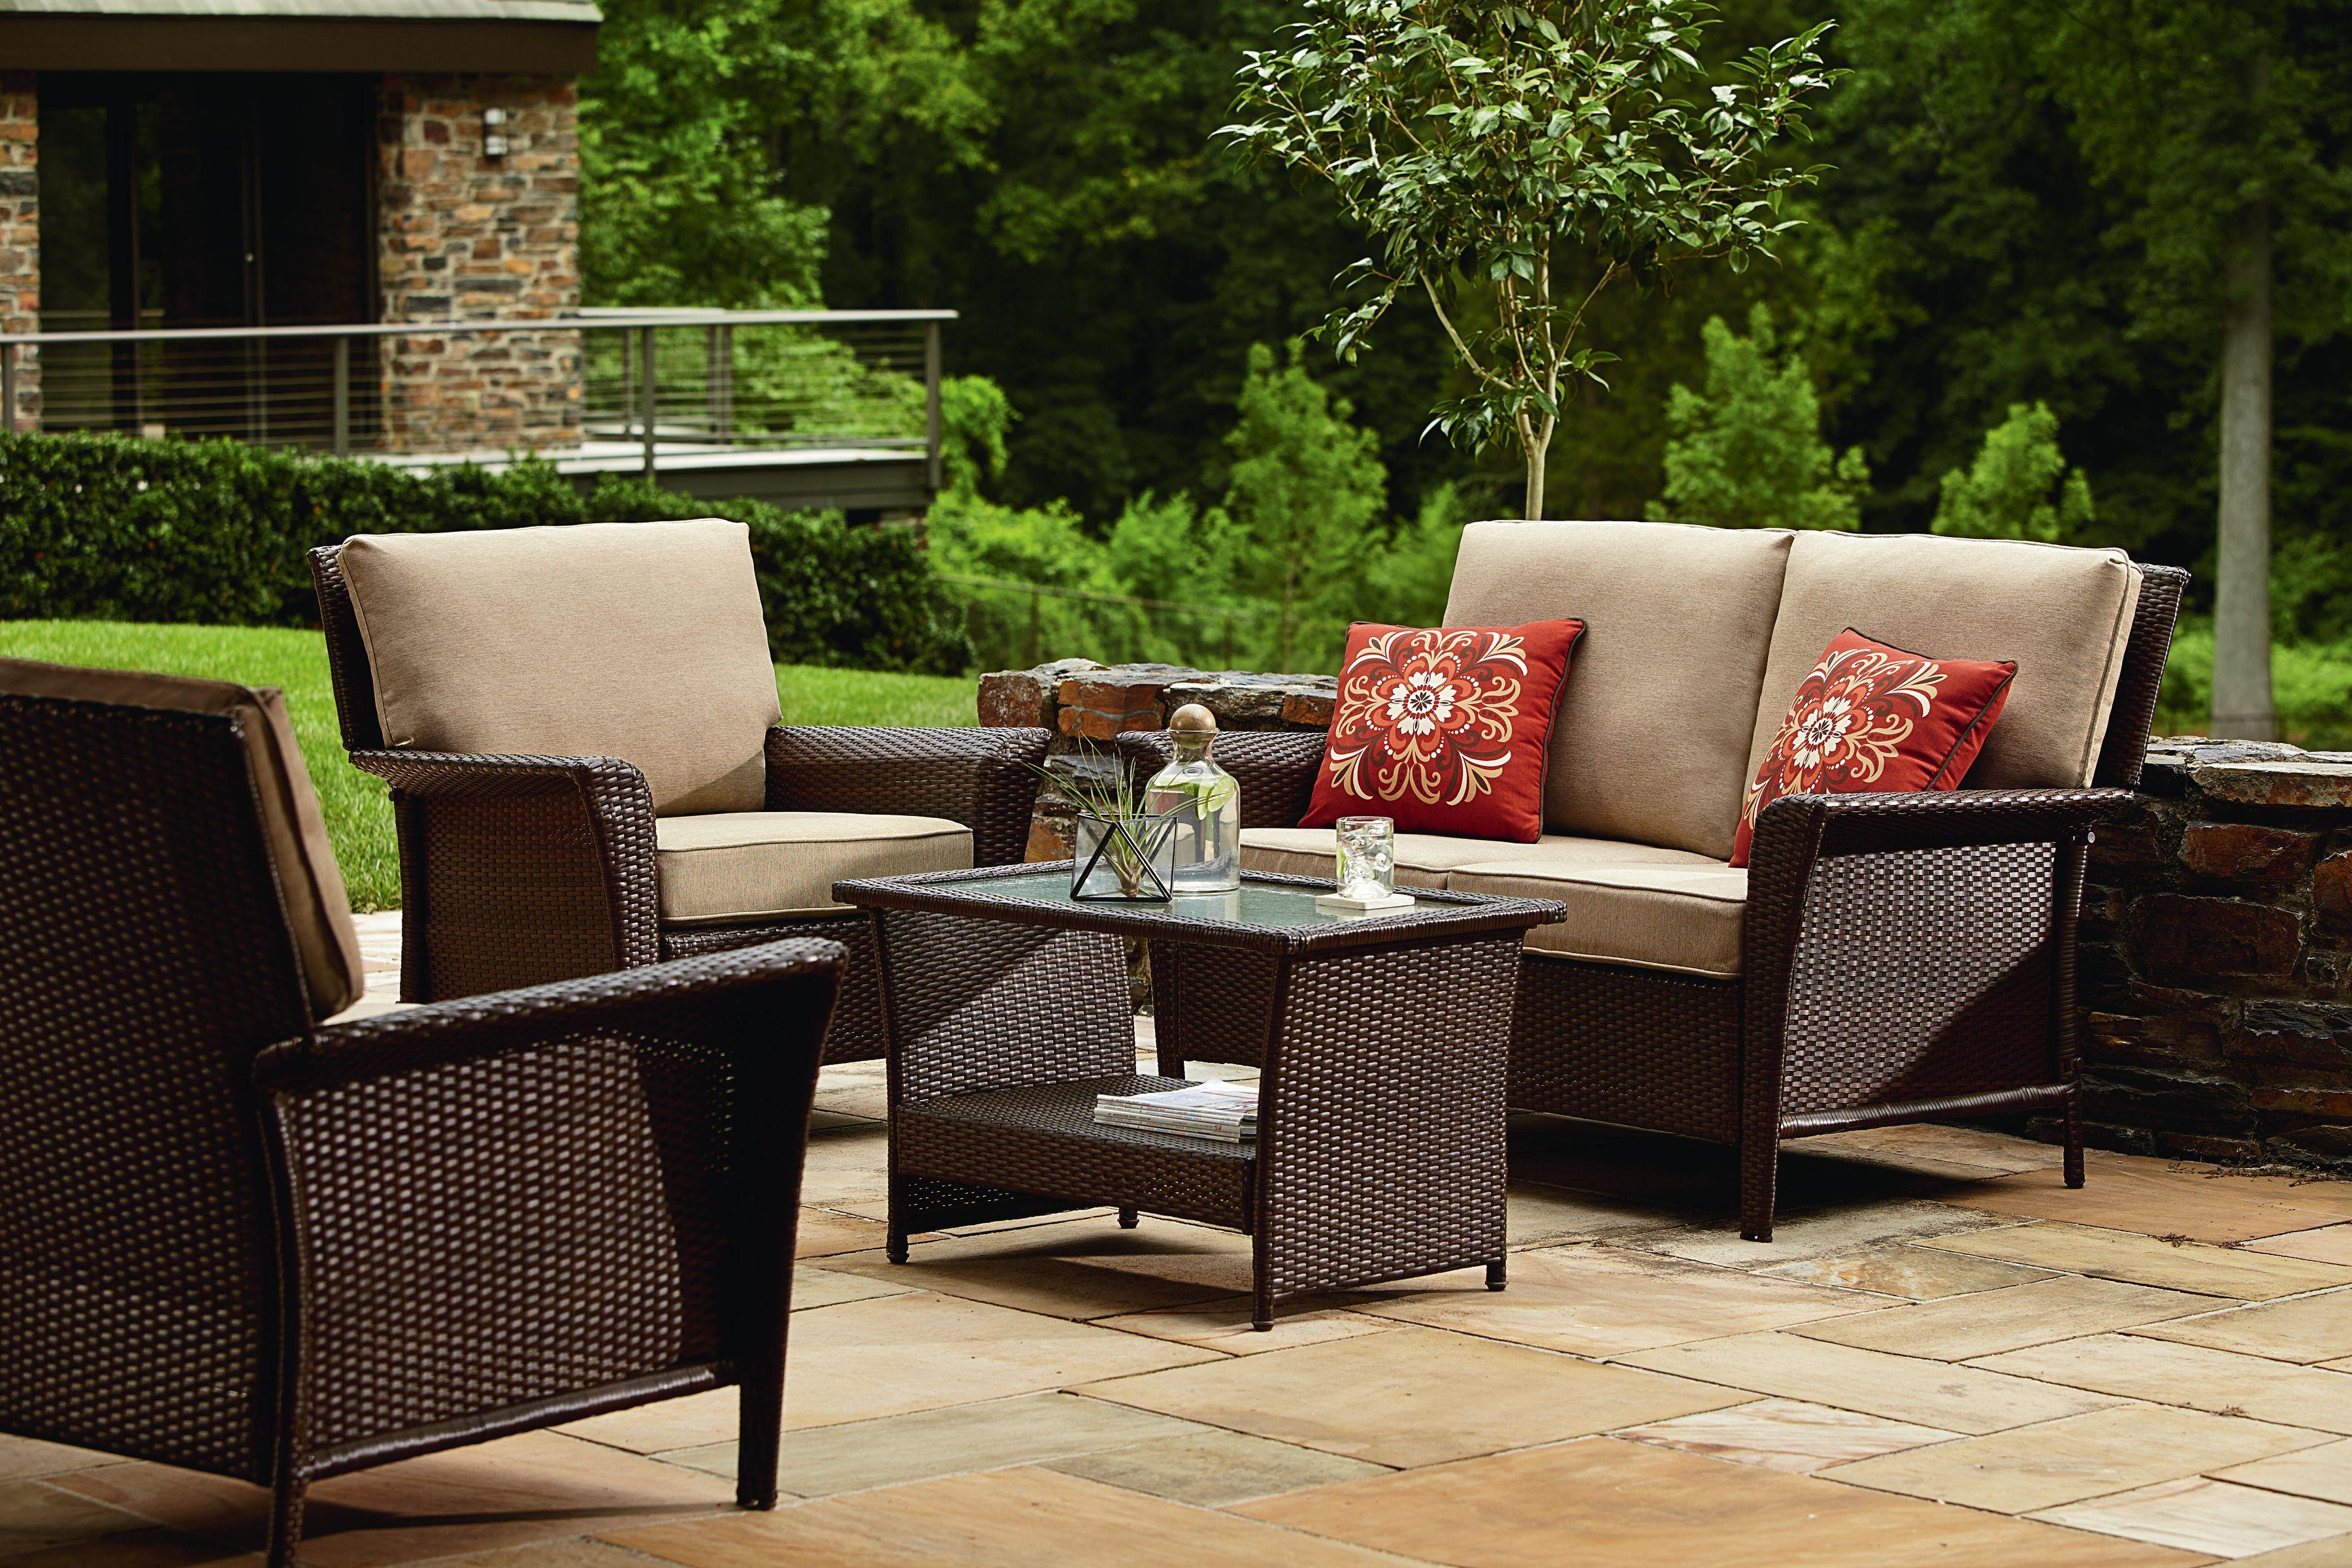 Home Idea Home Outdoor Furniture Porch Furniture Patio